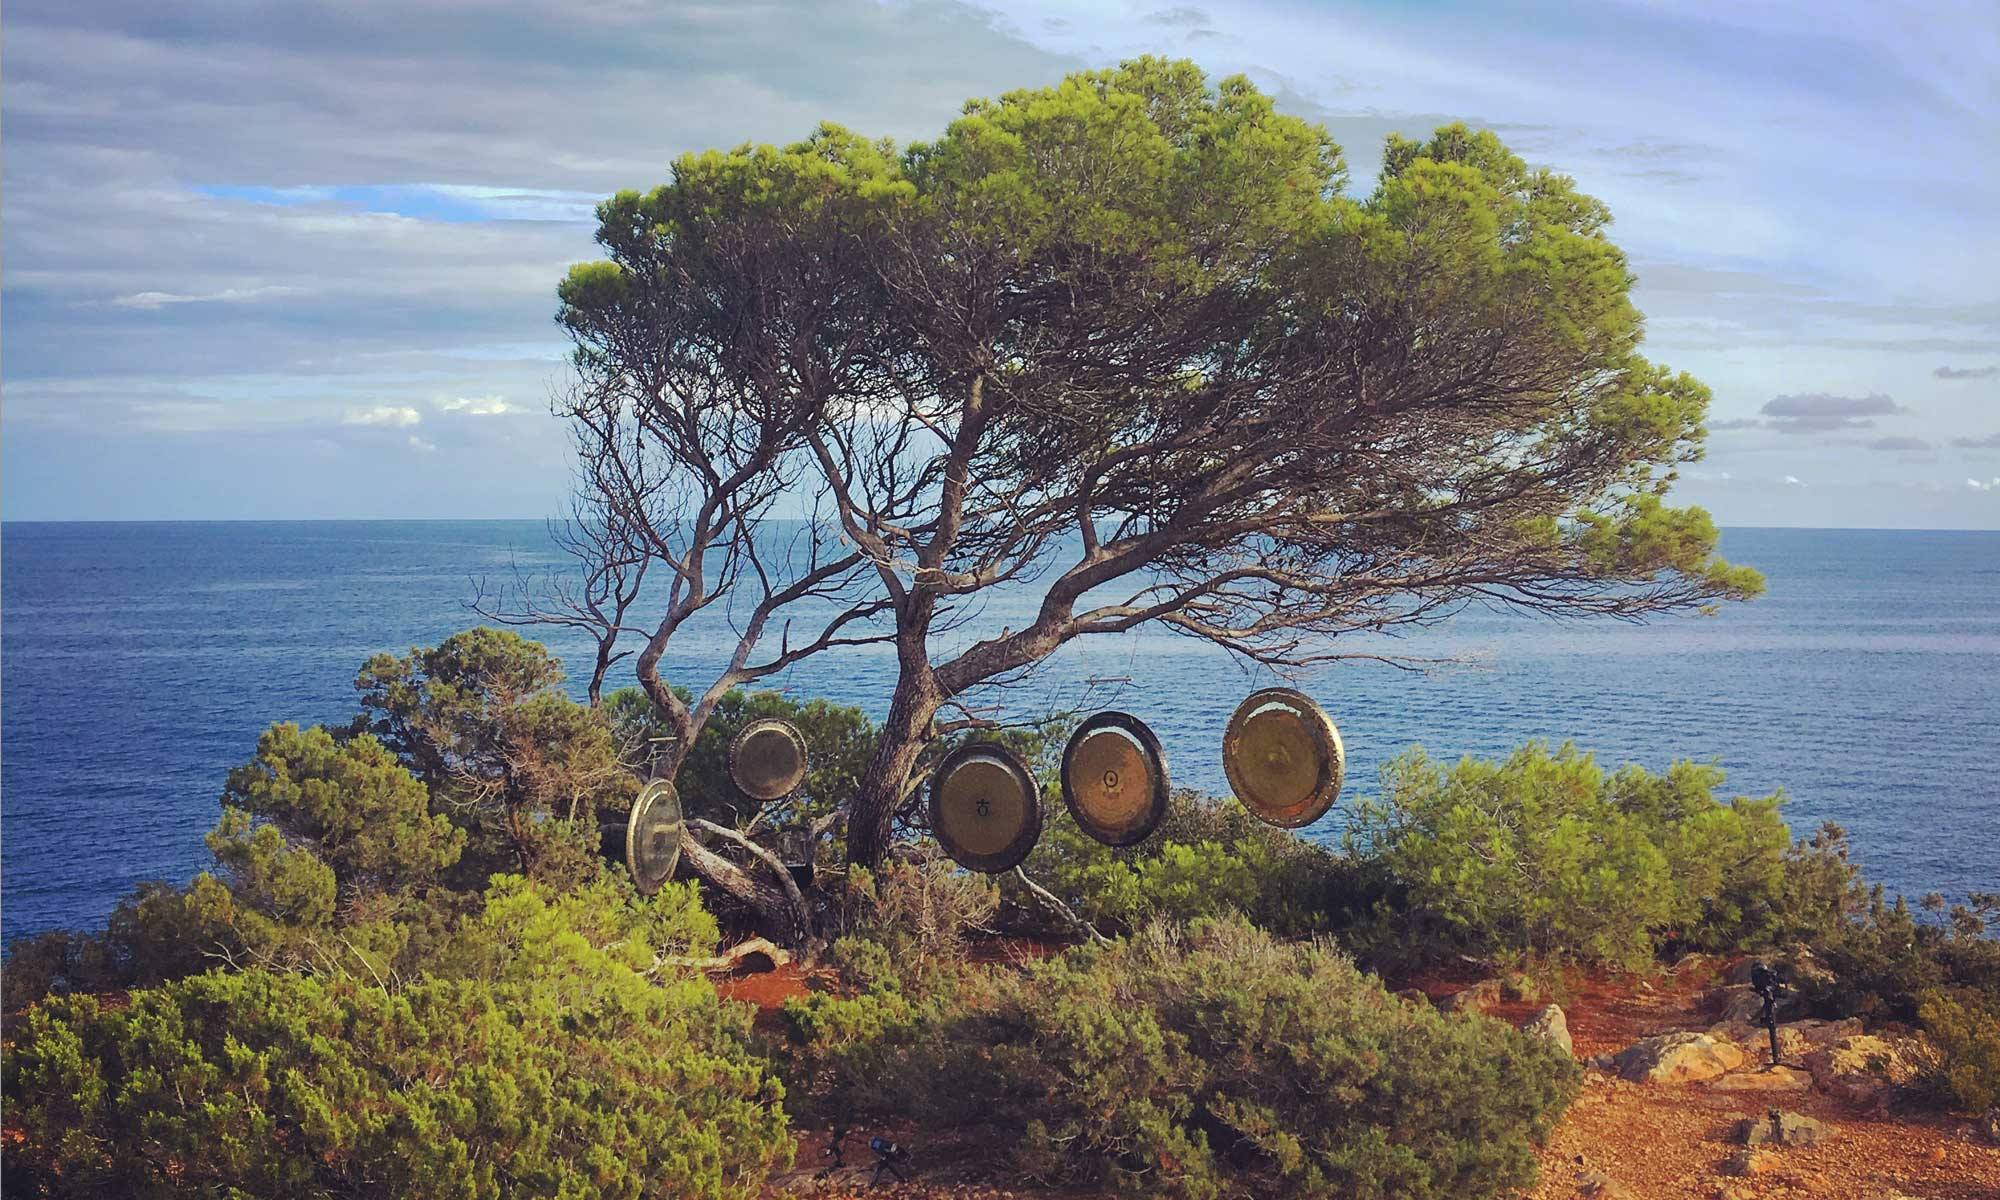 Gongs & Tree in Iibza